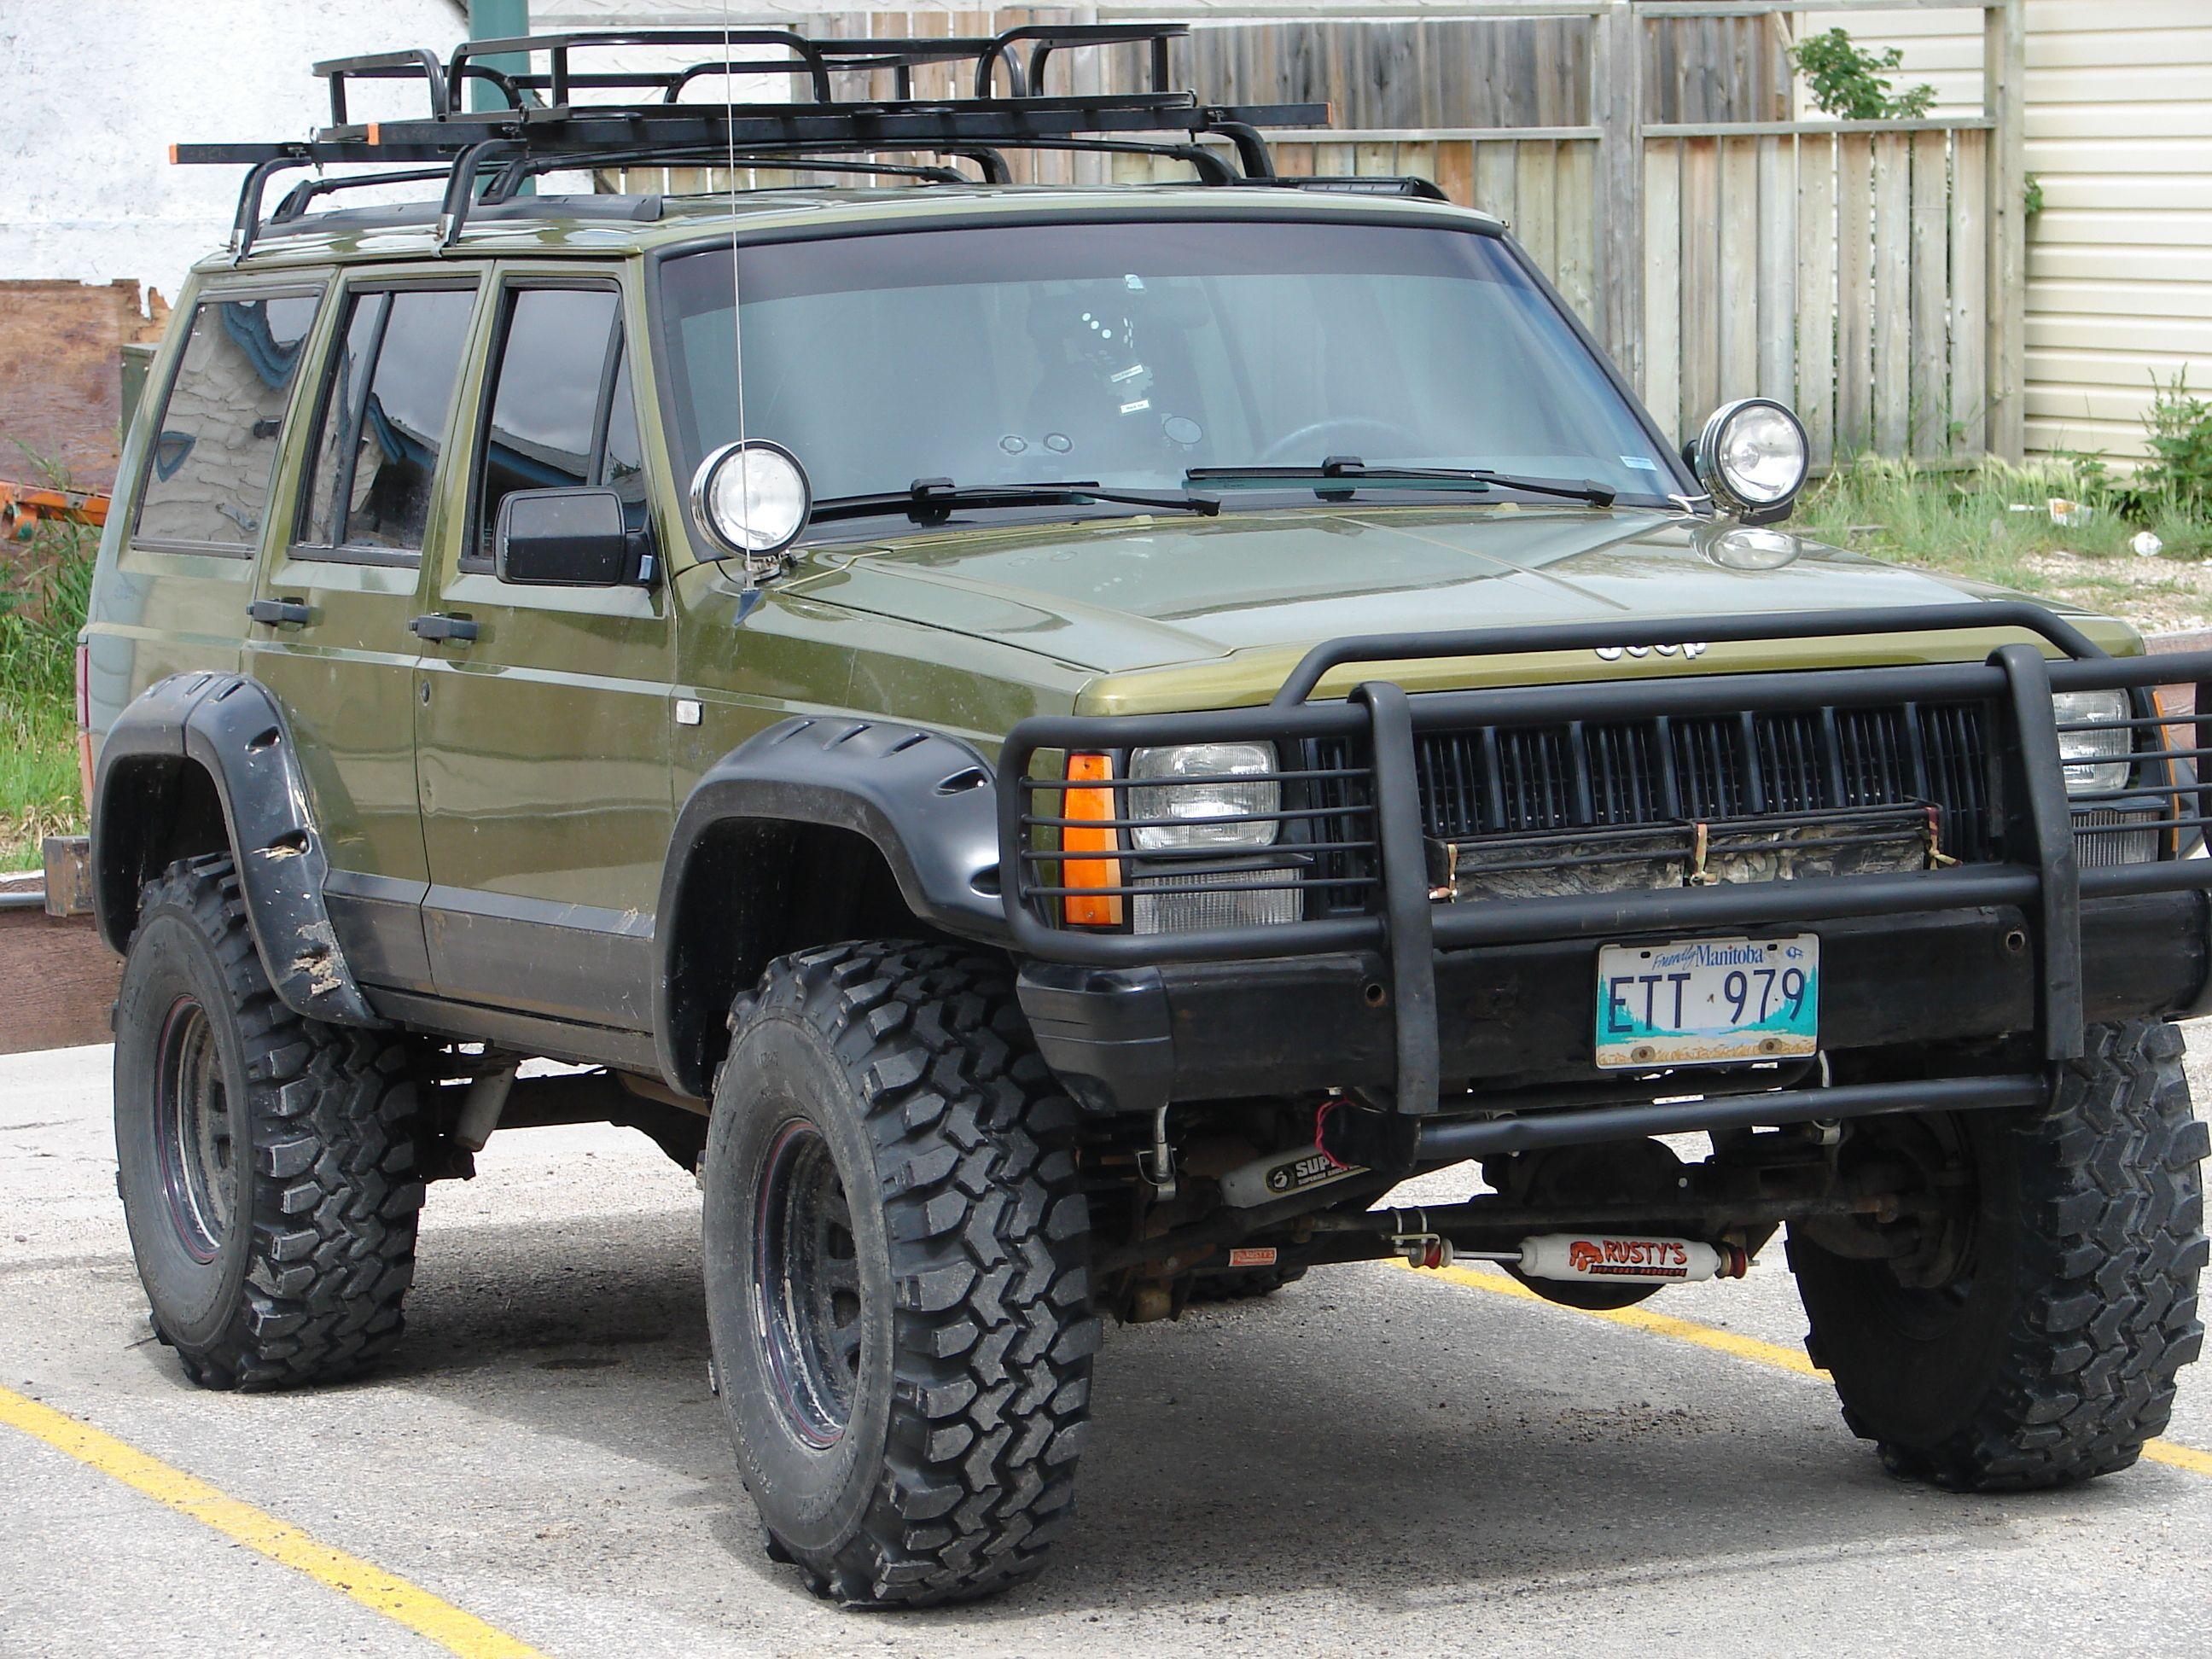 bjgreenham 1996 jeep cherokee 13286017 jeep xj classic cherokee pinterest cherokee jeeps. Black Bedroom Furniture Sets. Home Design Ideas